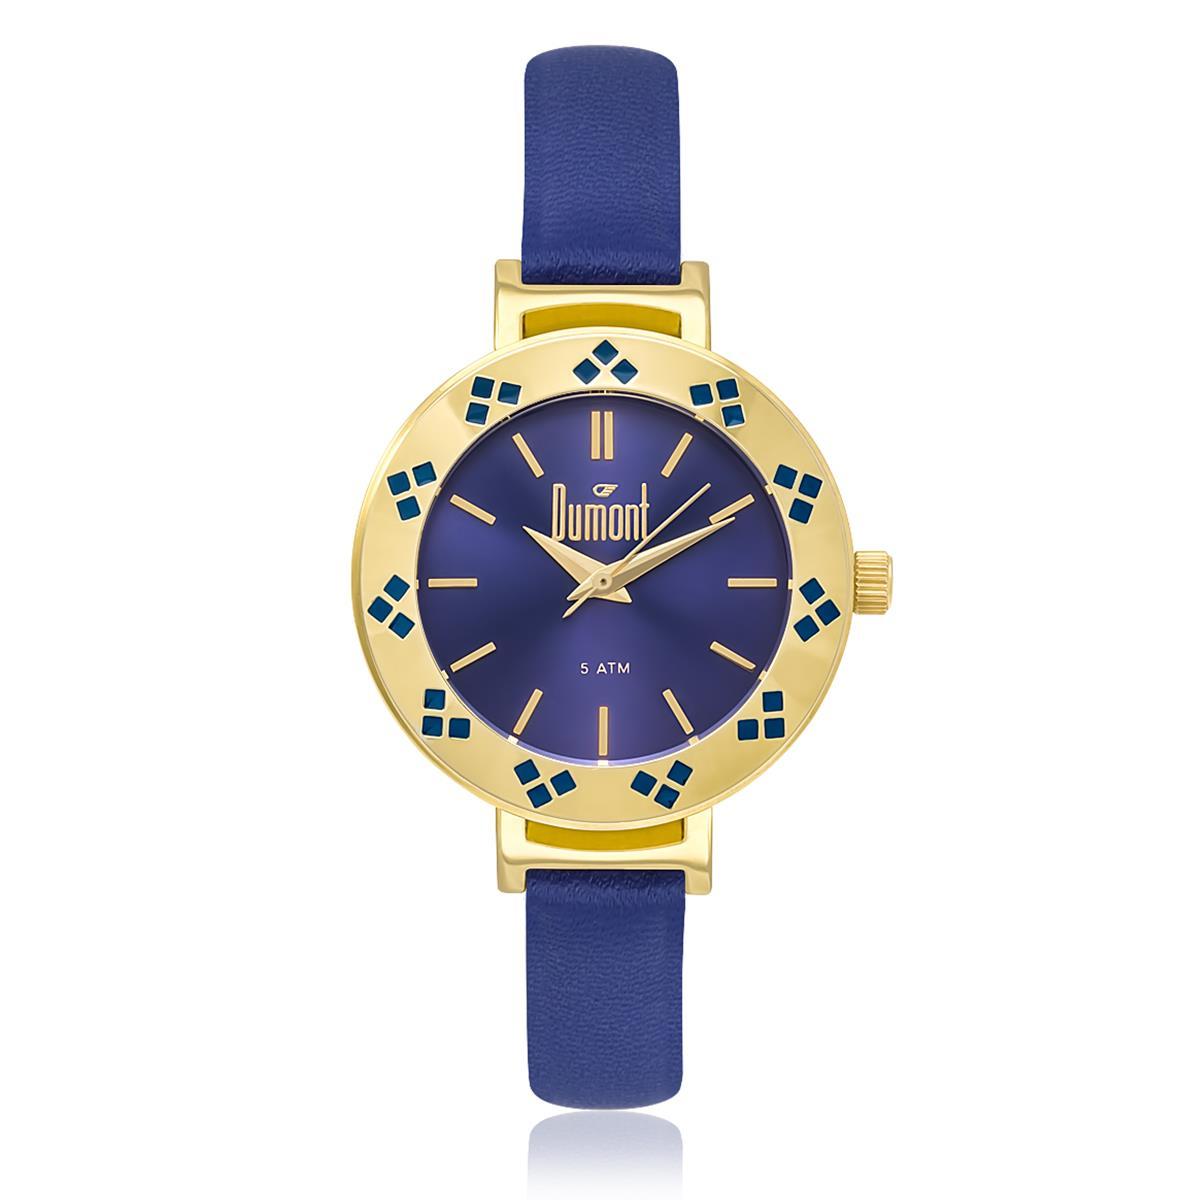 64c9dd2c082 Relógio Feminino Dumont Analógico DU2035L0A 4A Kit Troca Pulseira